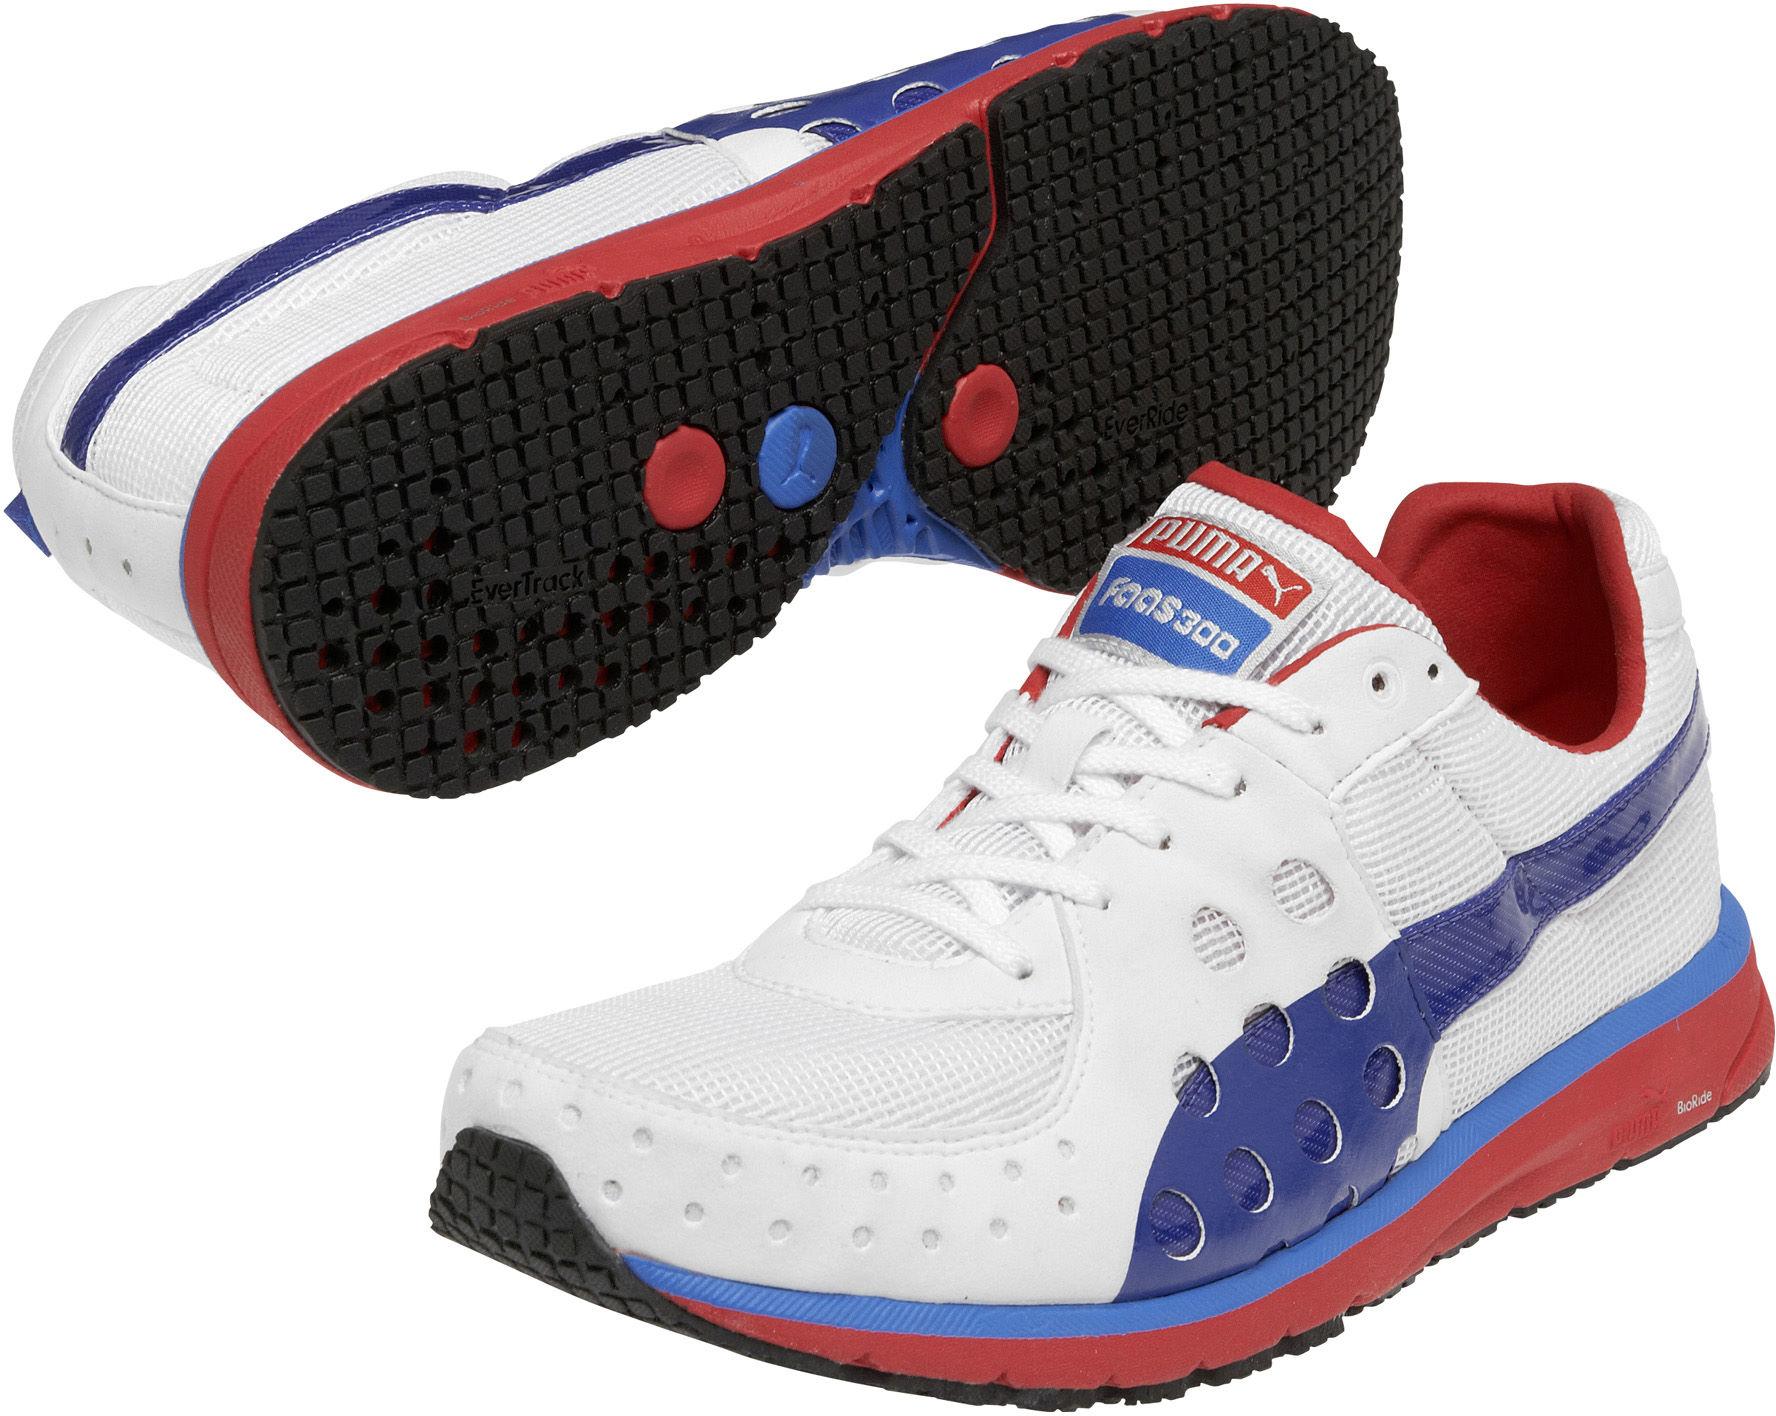 puma faas 300 shoes aw12 MXZGURS